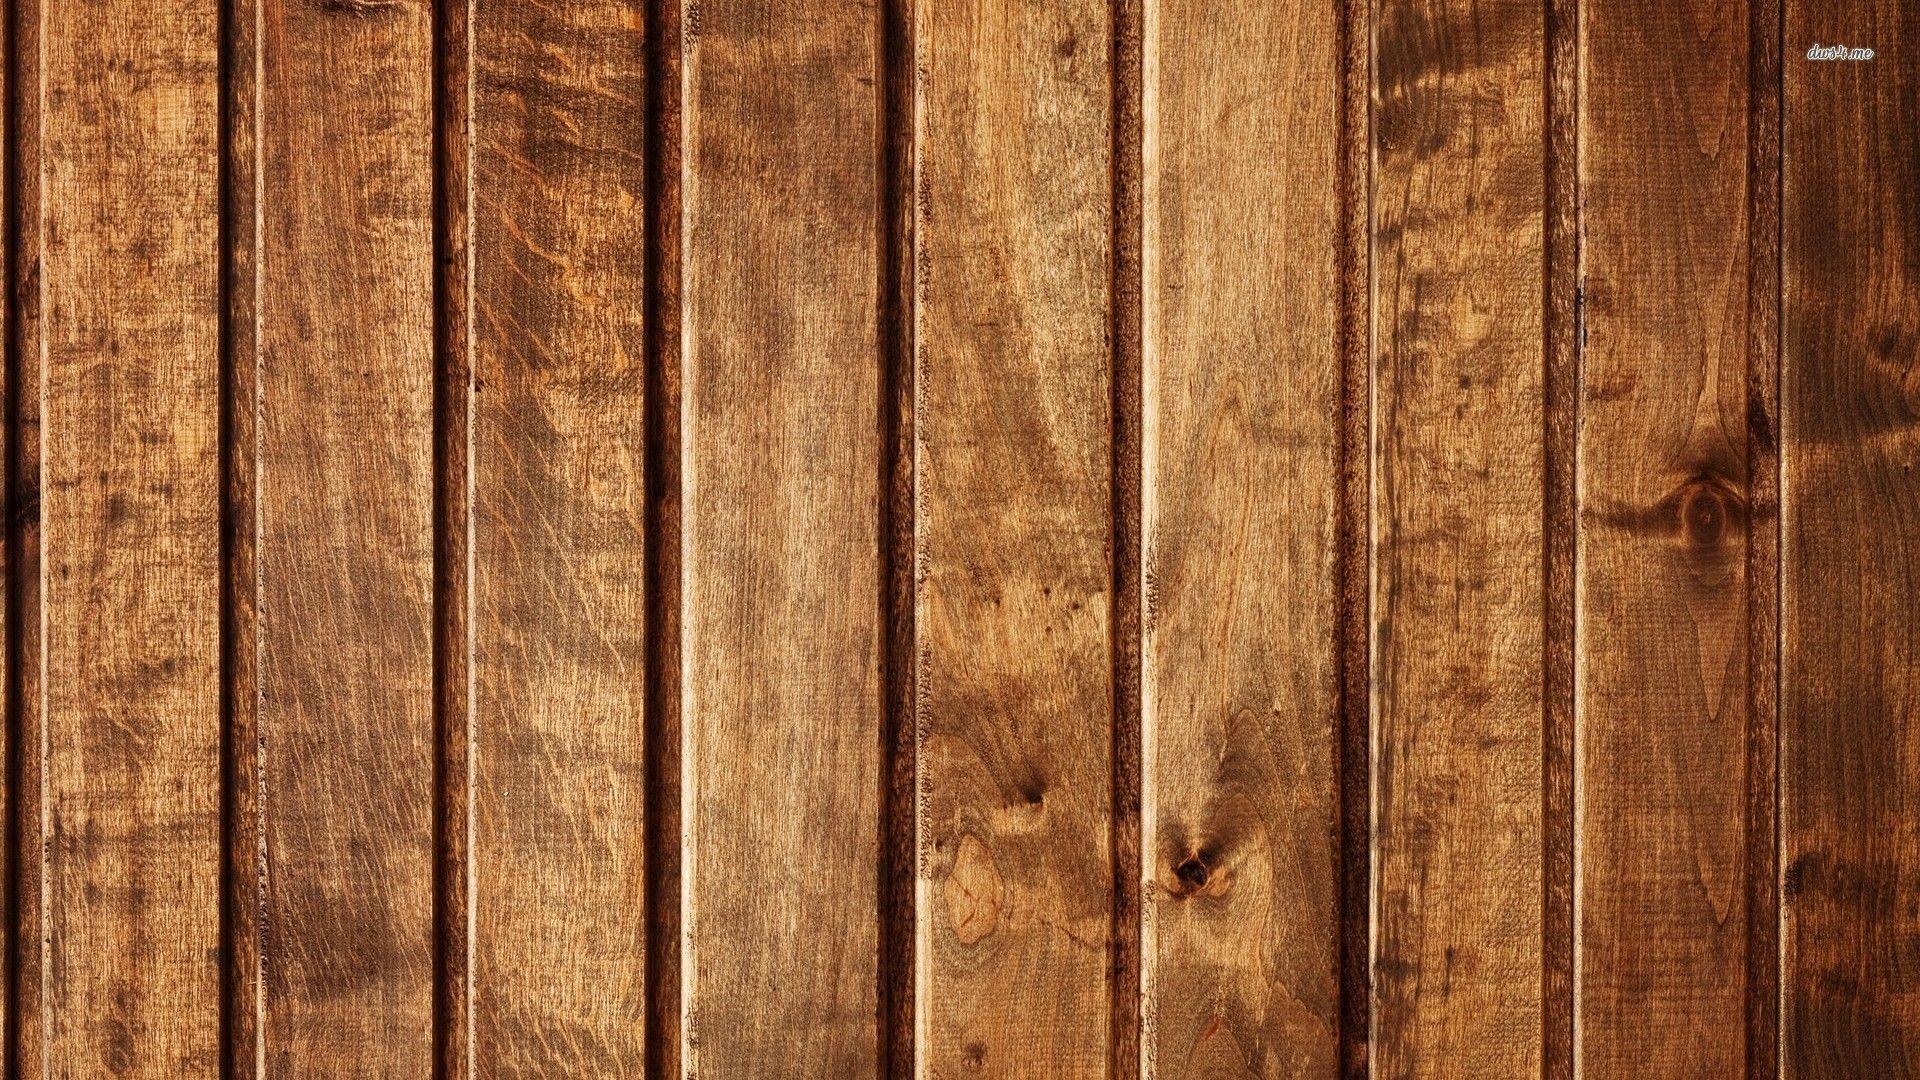 HD Quality Wood Rustic Background Wallpaper – SiWallpaper 19093